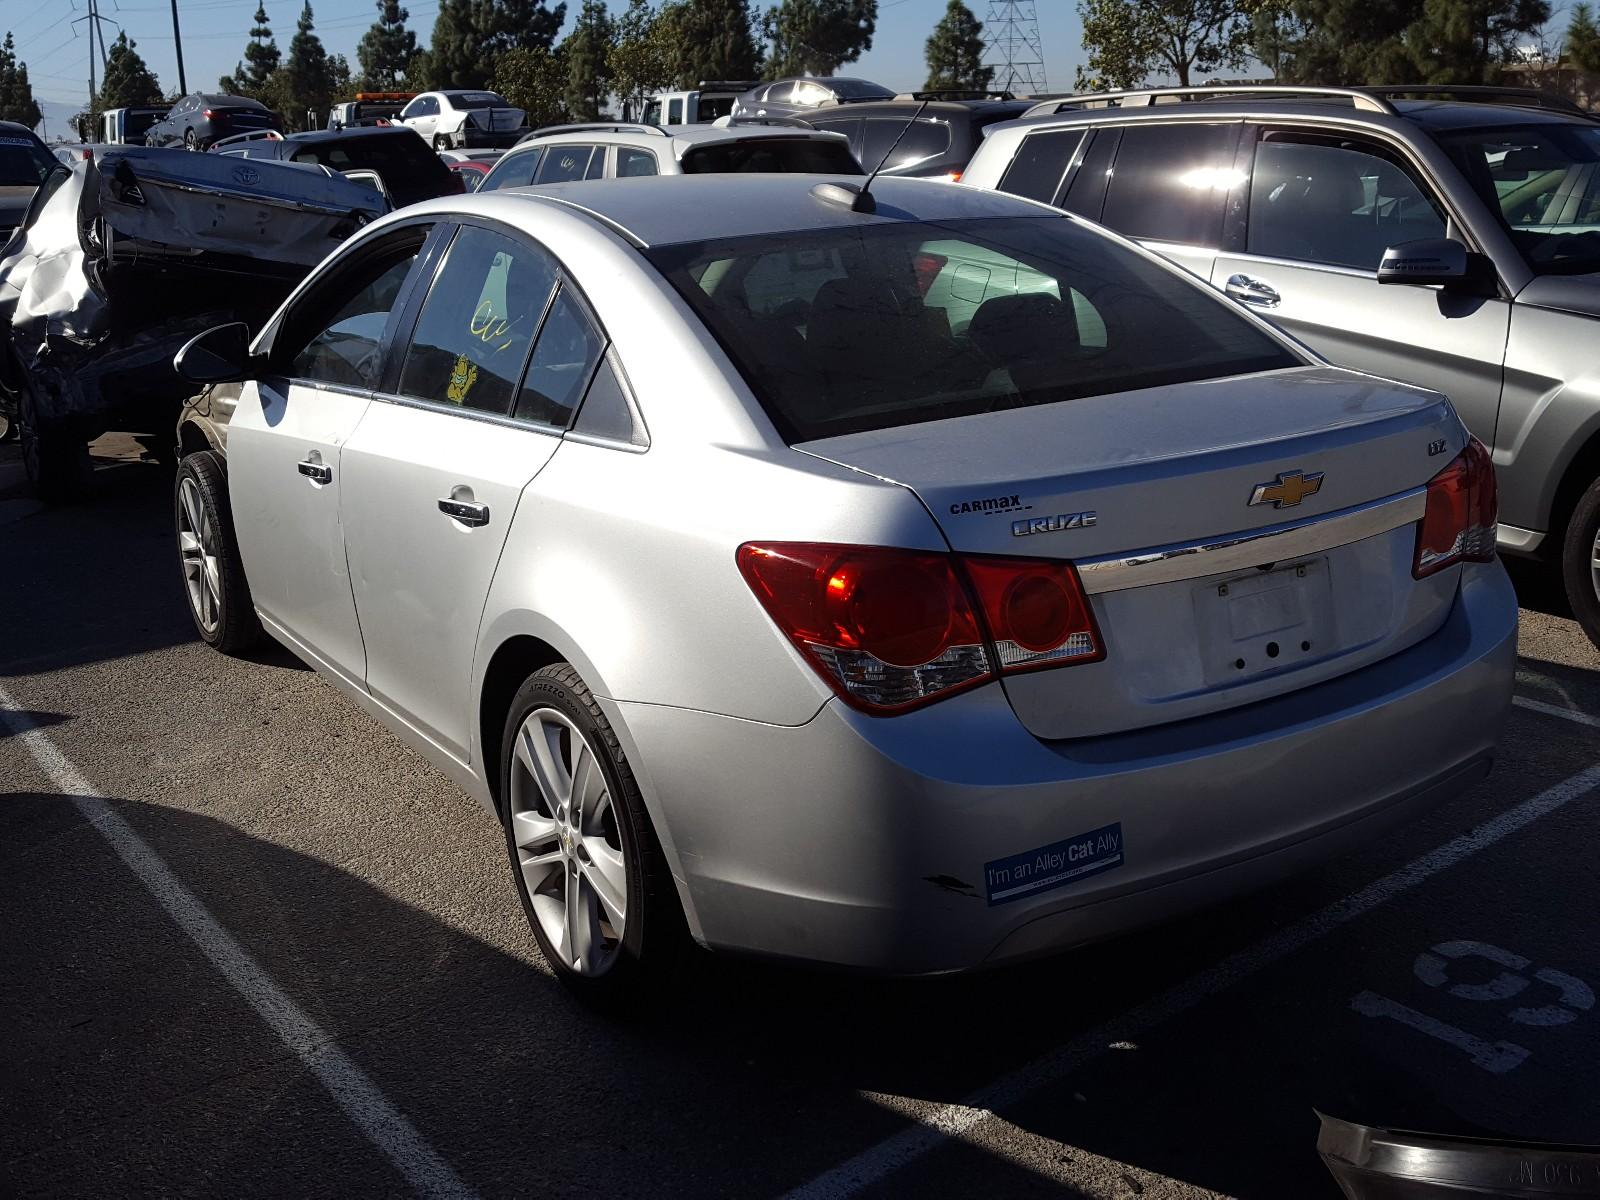 1G1PG5SB0G7130991 - 2016 Chevrolet Cruze Limi 1.4L [Angle] View